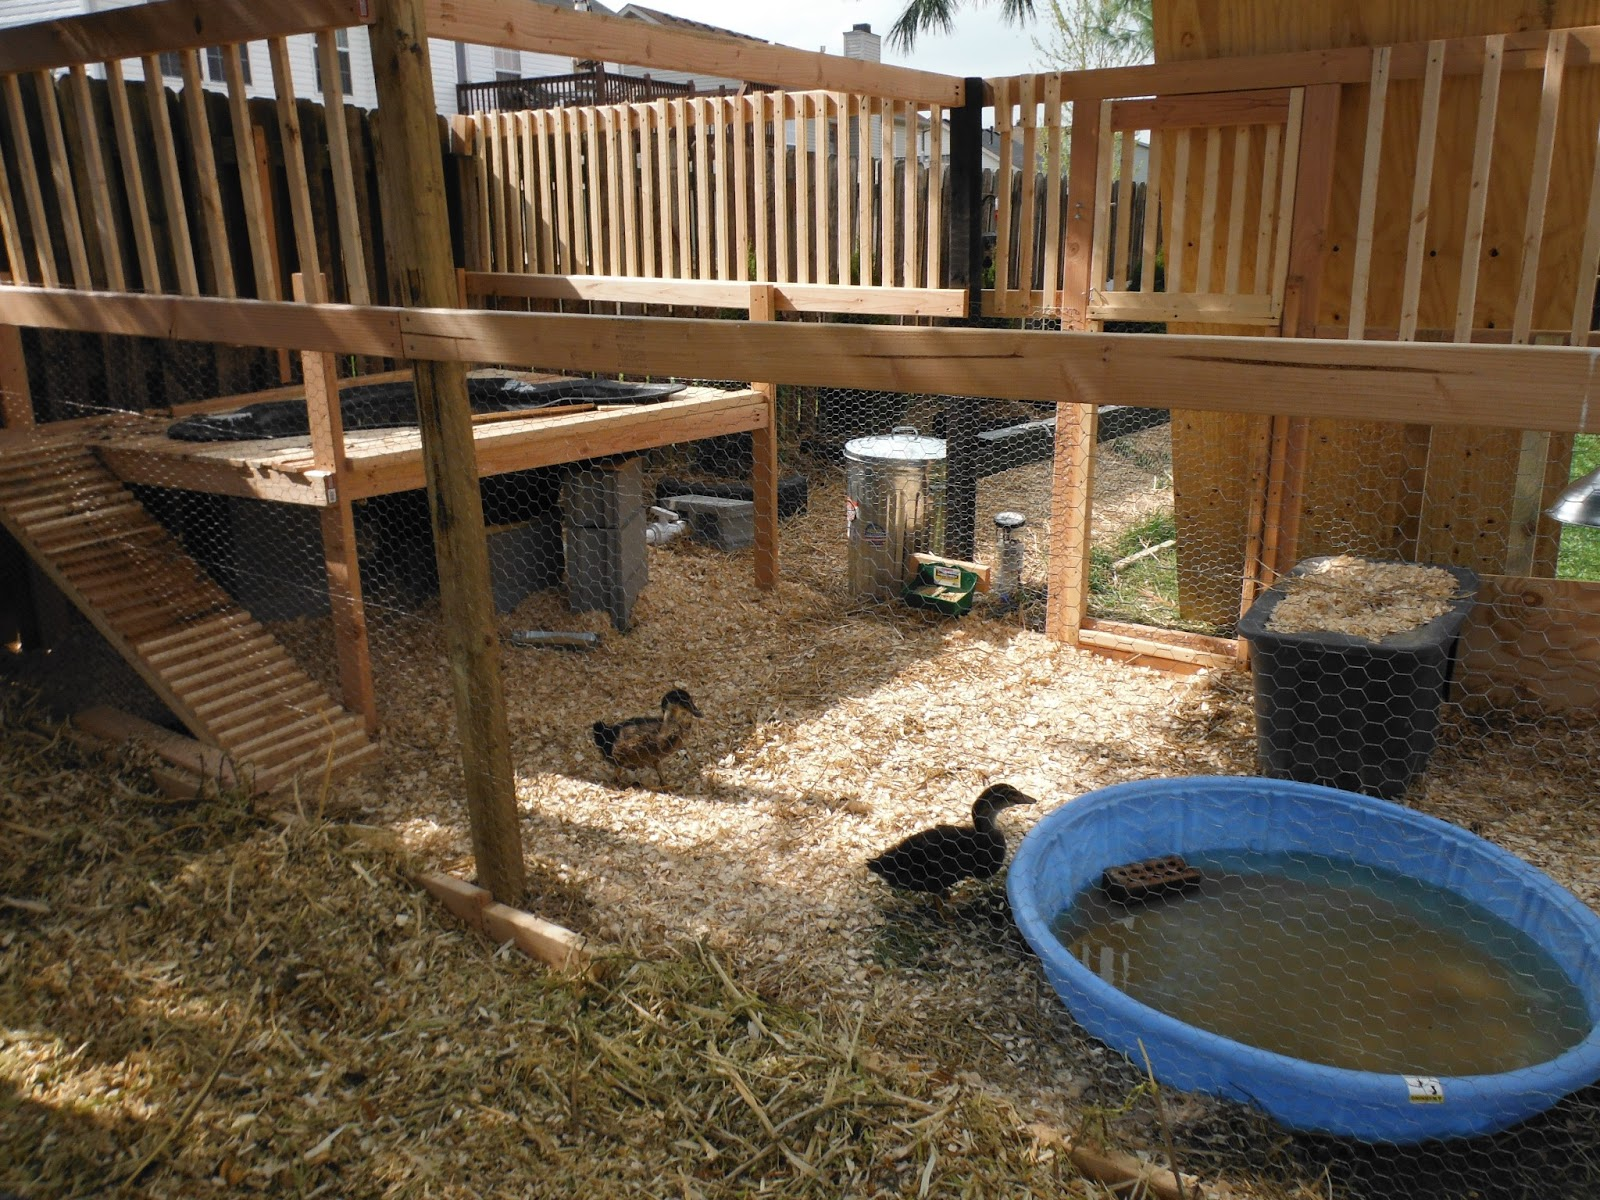 Suburban Backyard Farming : Suburban Backyard Farm